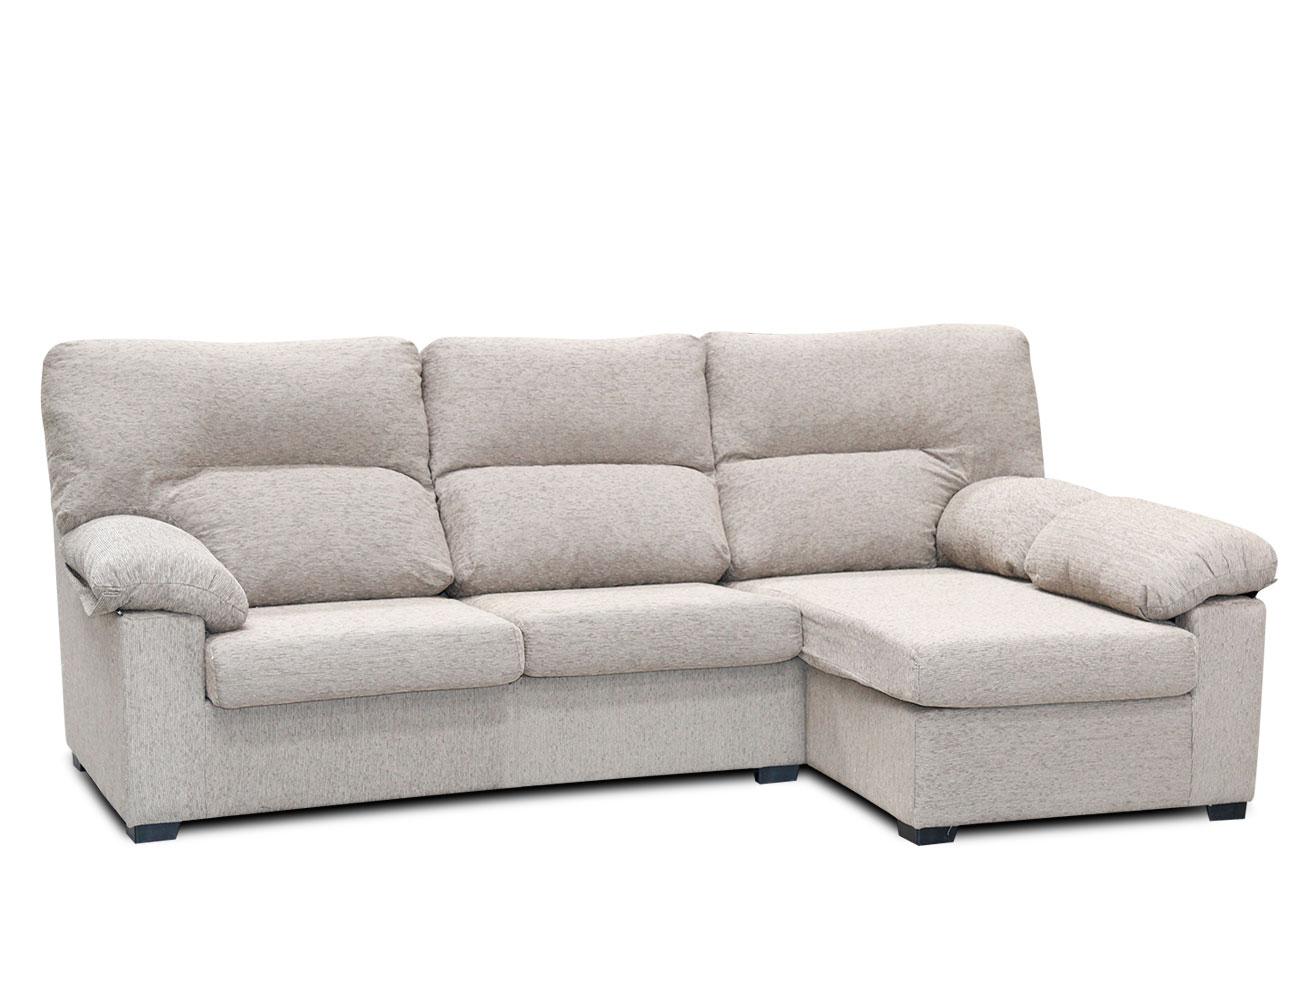 Sof chaise longue reversible barato 15374 factory del for Comprar chaise longue barato online